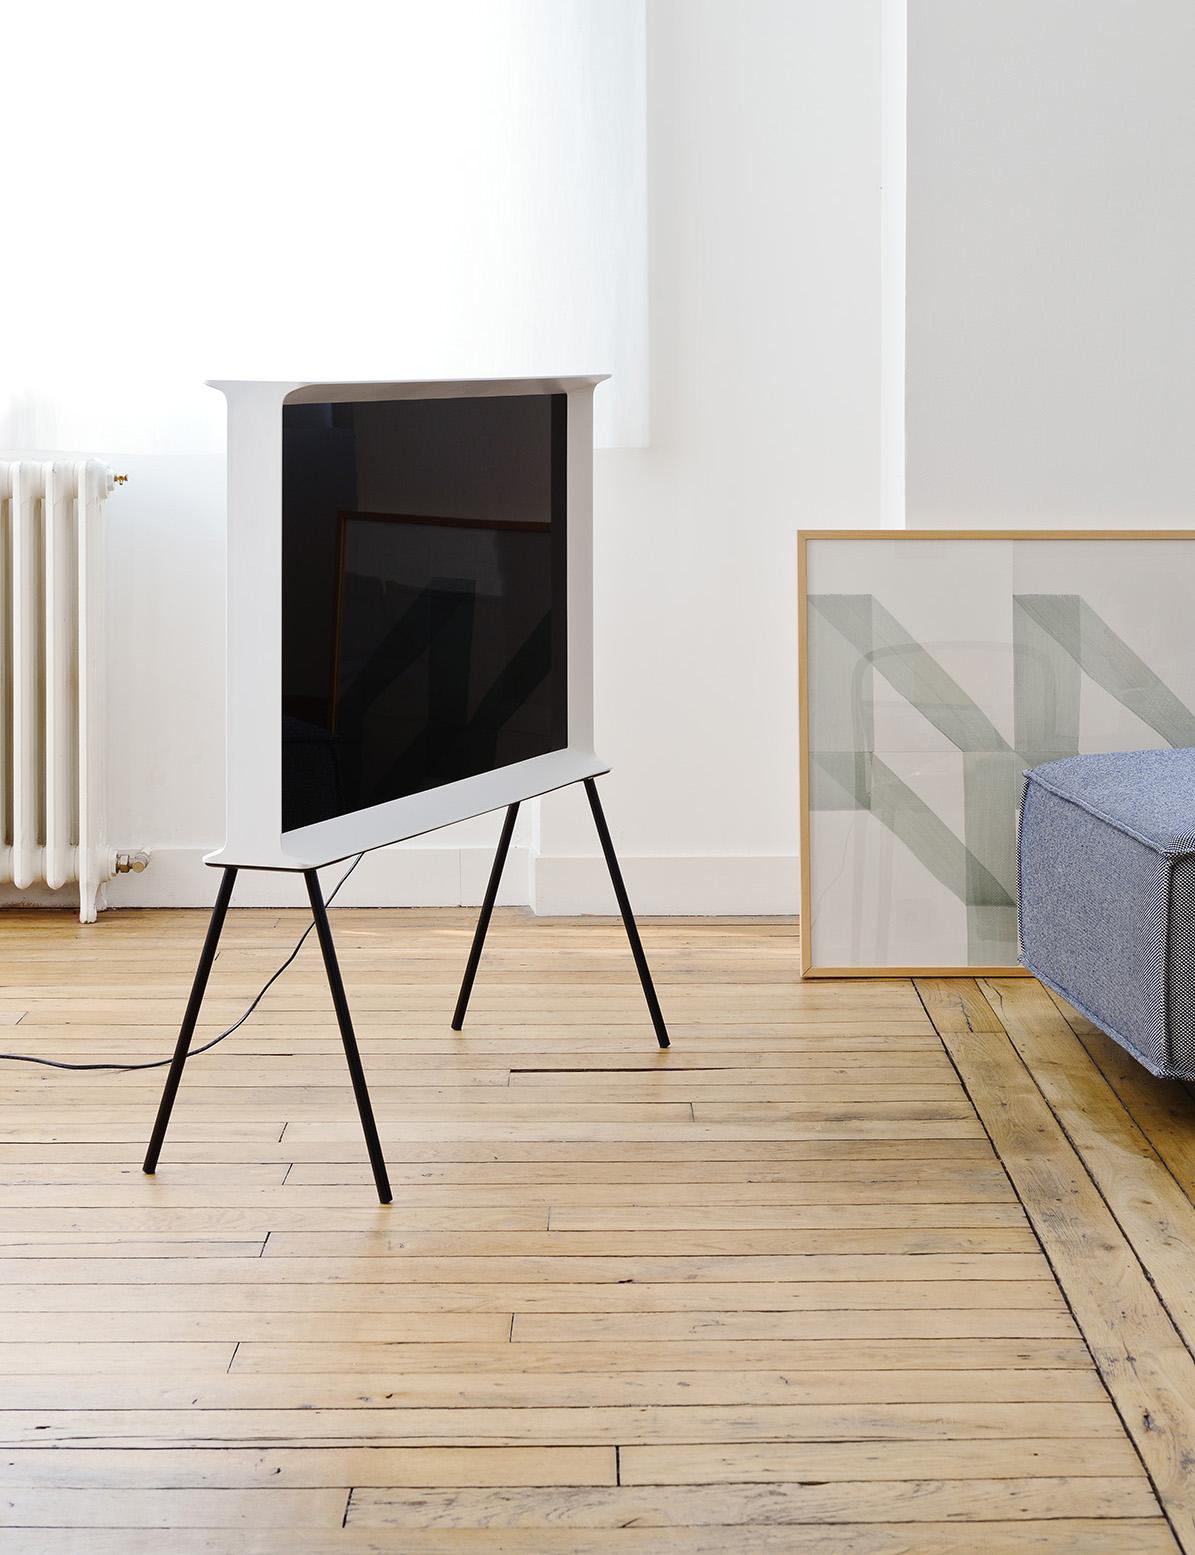 ronan erwan bouroullec 39 s samsung serif tv design milk. Black Bedroom Furniture Sets. Home Design Ideas